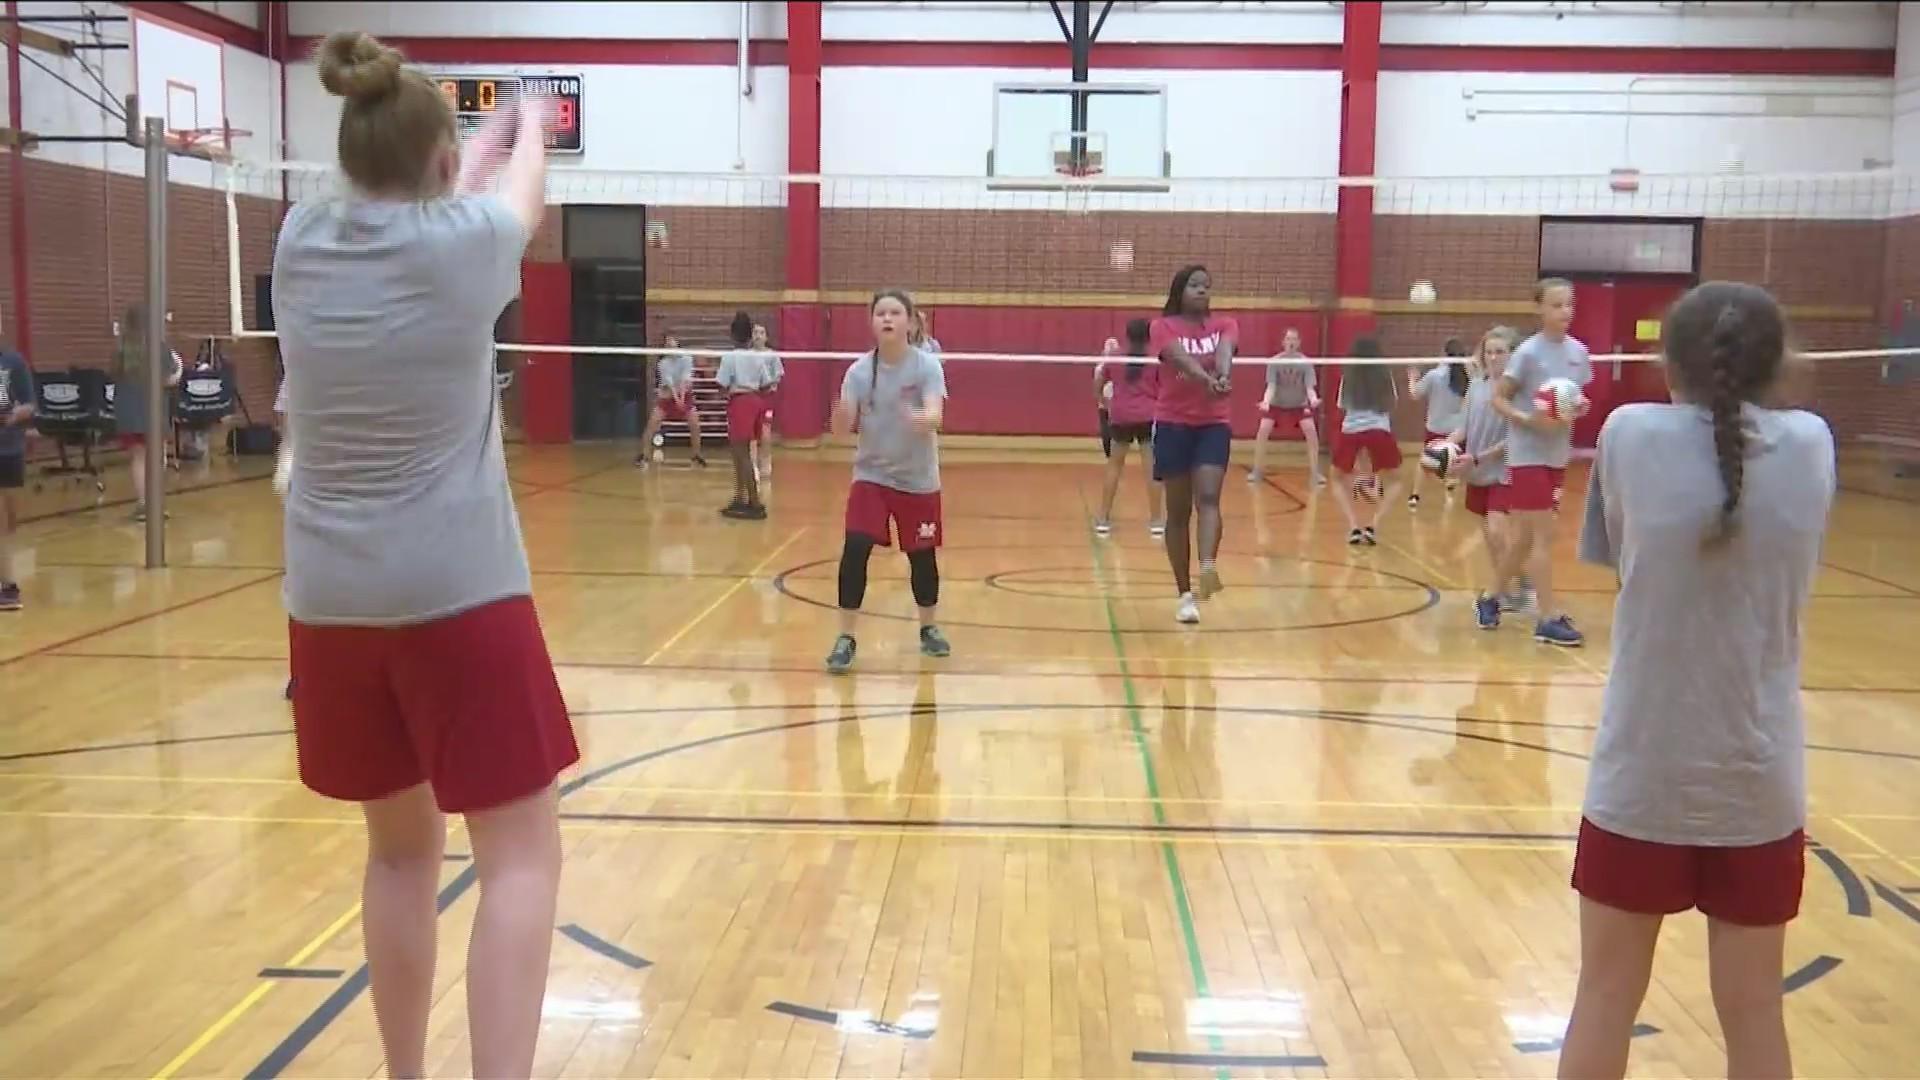 Abilene ISD pre-athletics program gets athletes a head start on the fundamentals